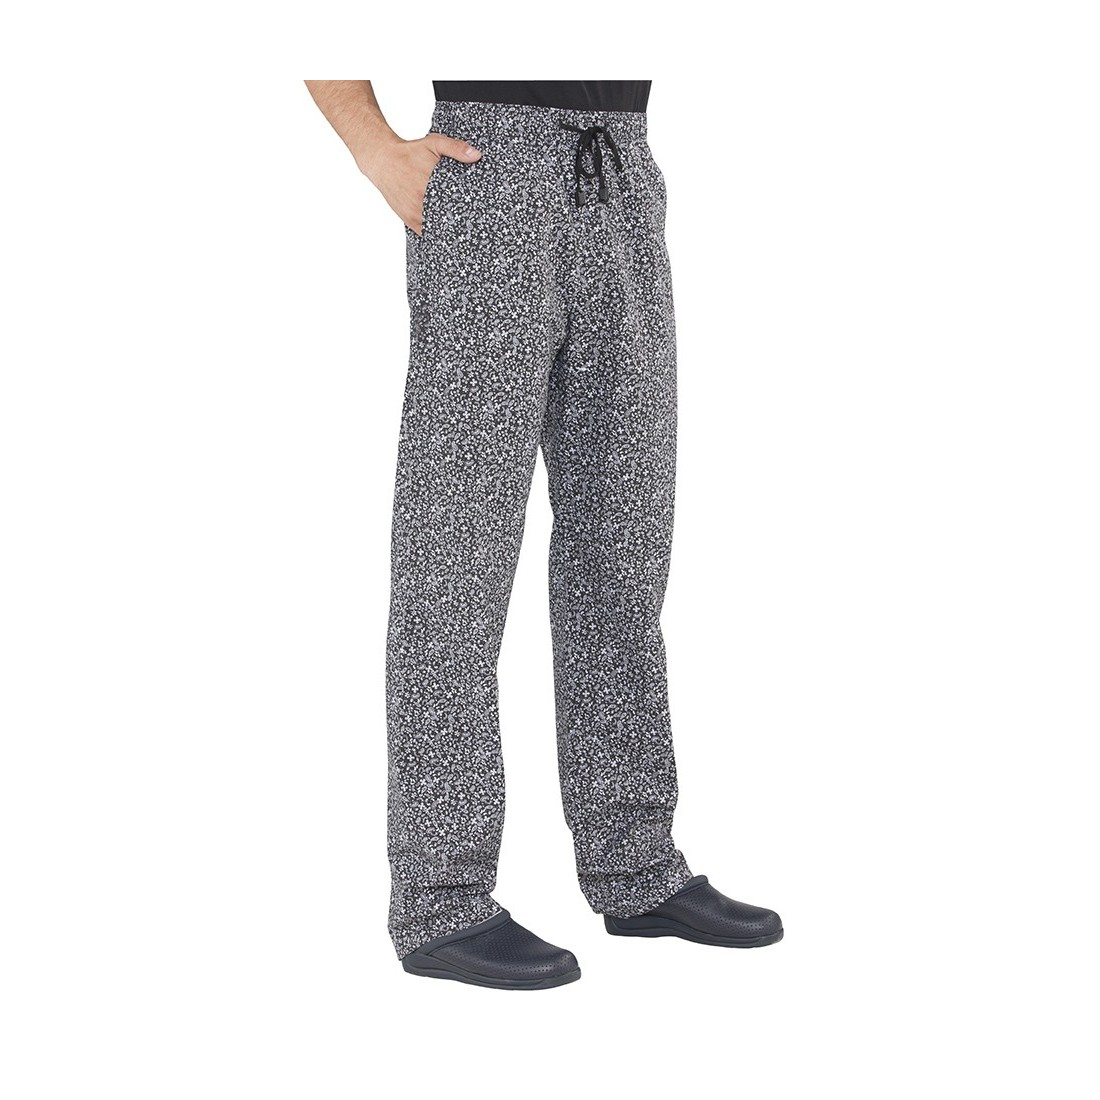 Pantalón con goma estampado